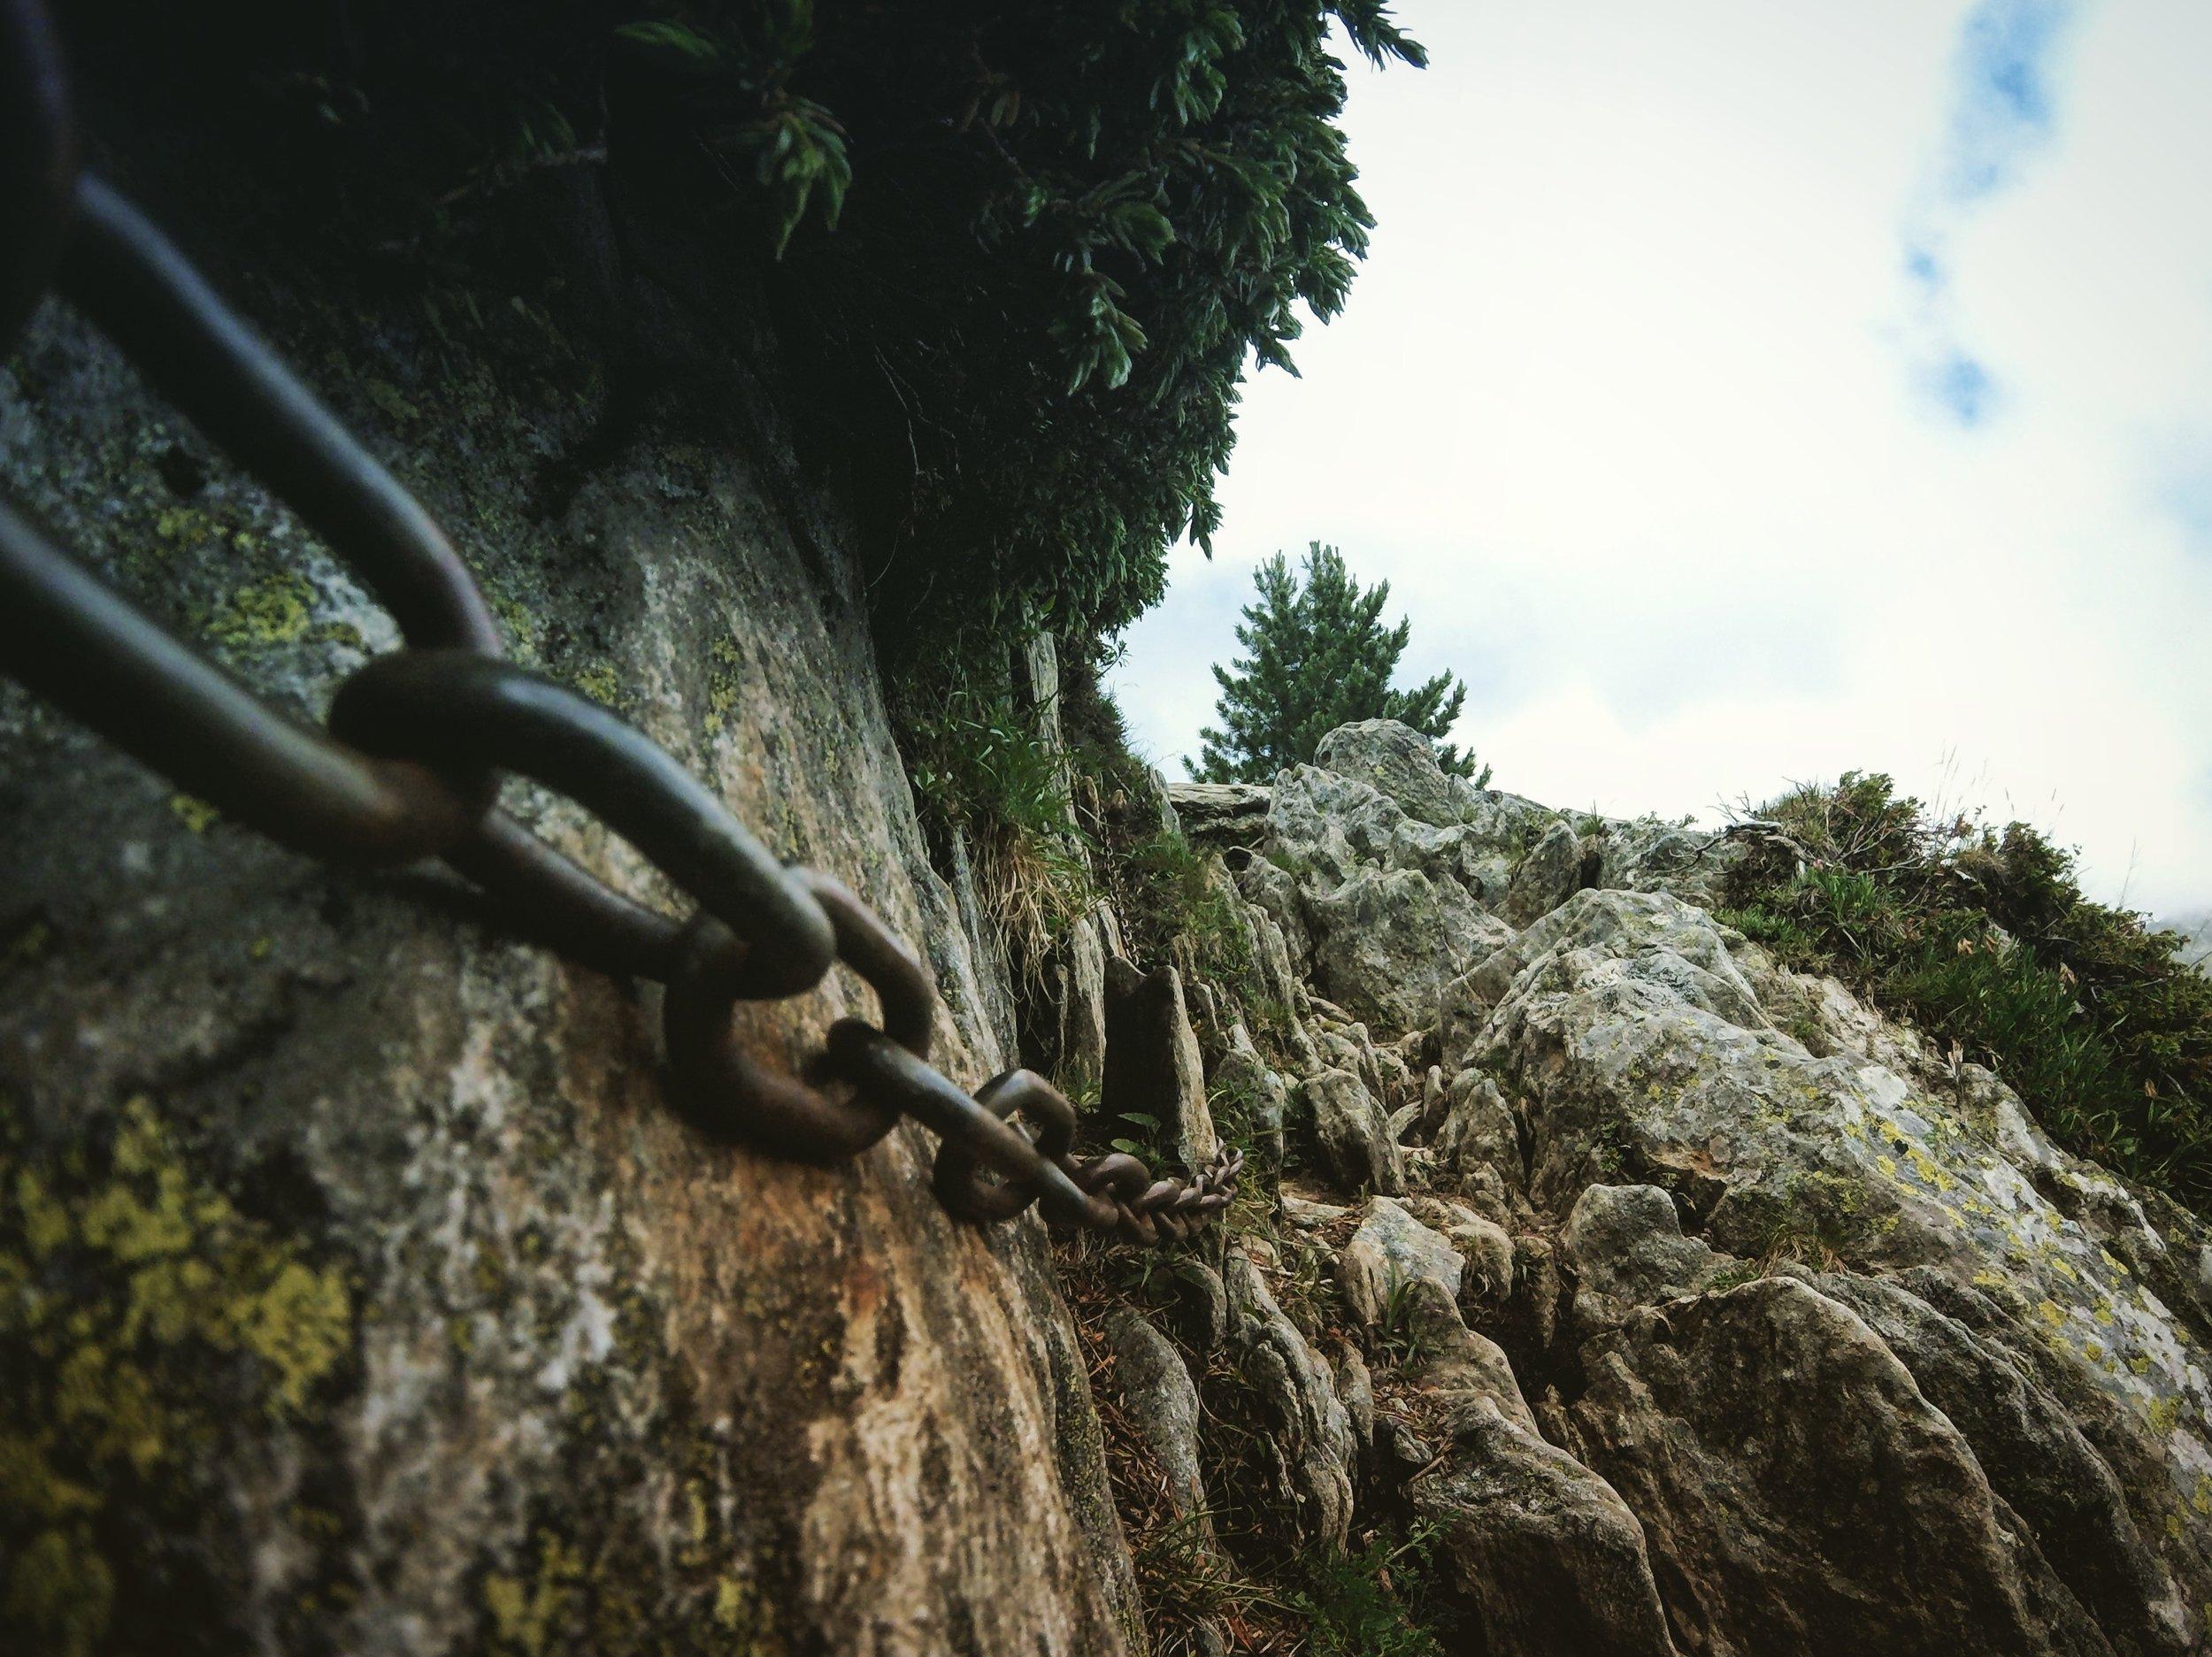 Day 3:   Col de la Forclaz   Breaks in the clouds not in the chains. The trail narrows towards Col de la Forclaz.